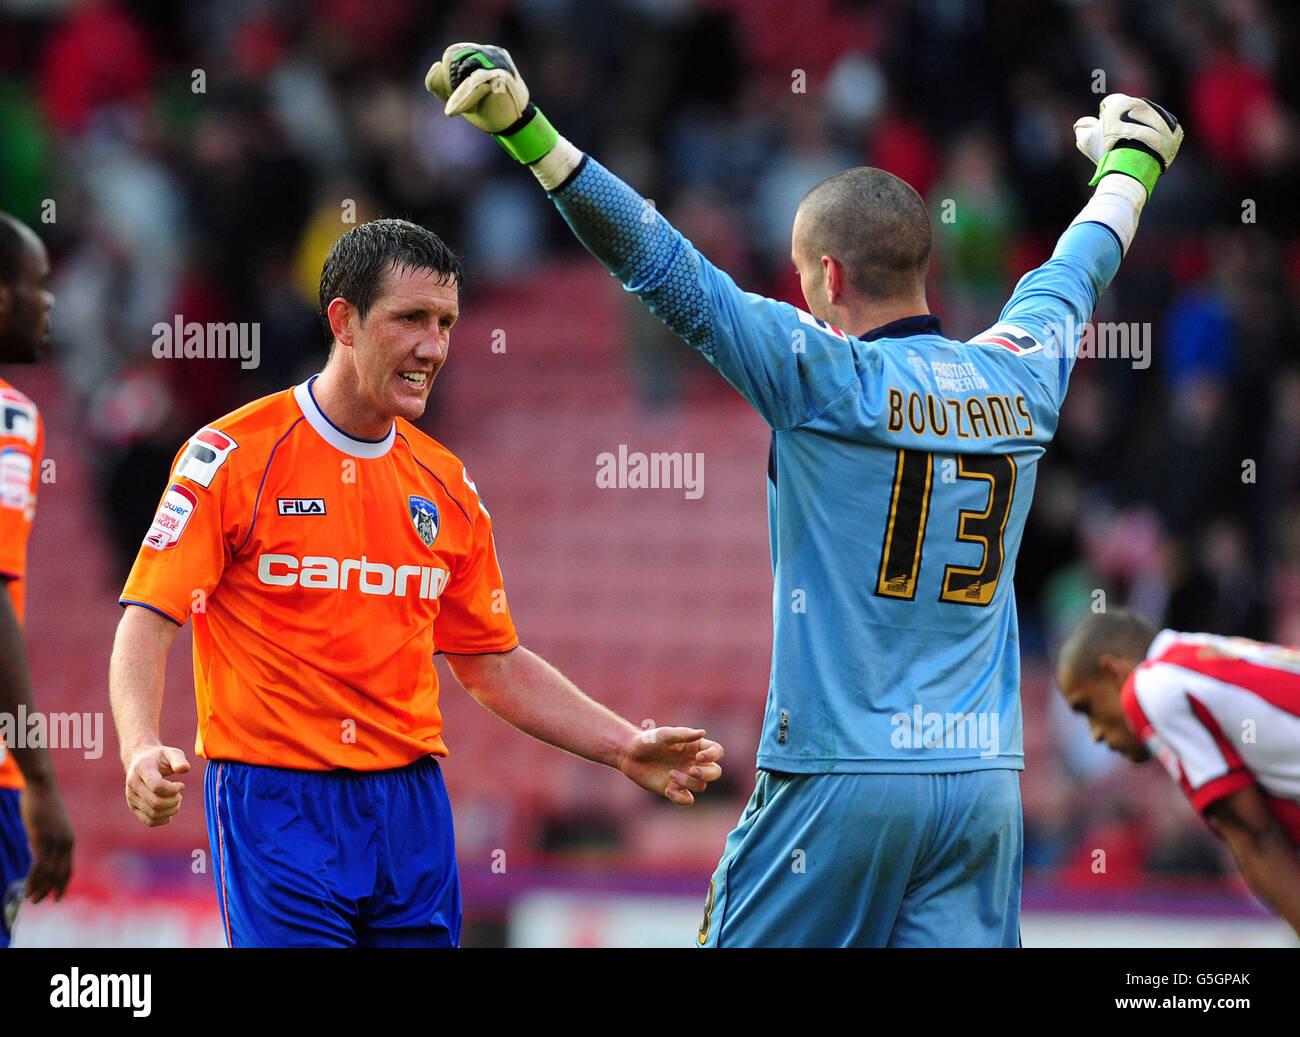 Soccer - npower Football League One - Sheffield United v Oldham Athletic - Bramall Lane - Stock Image